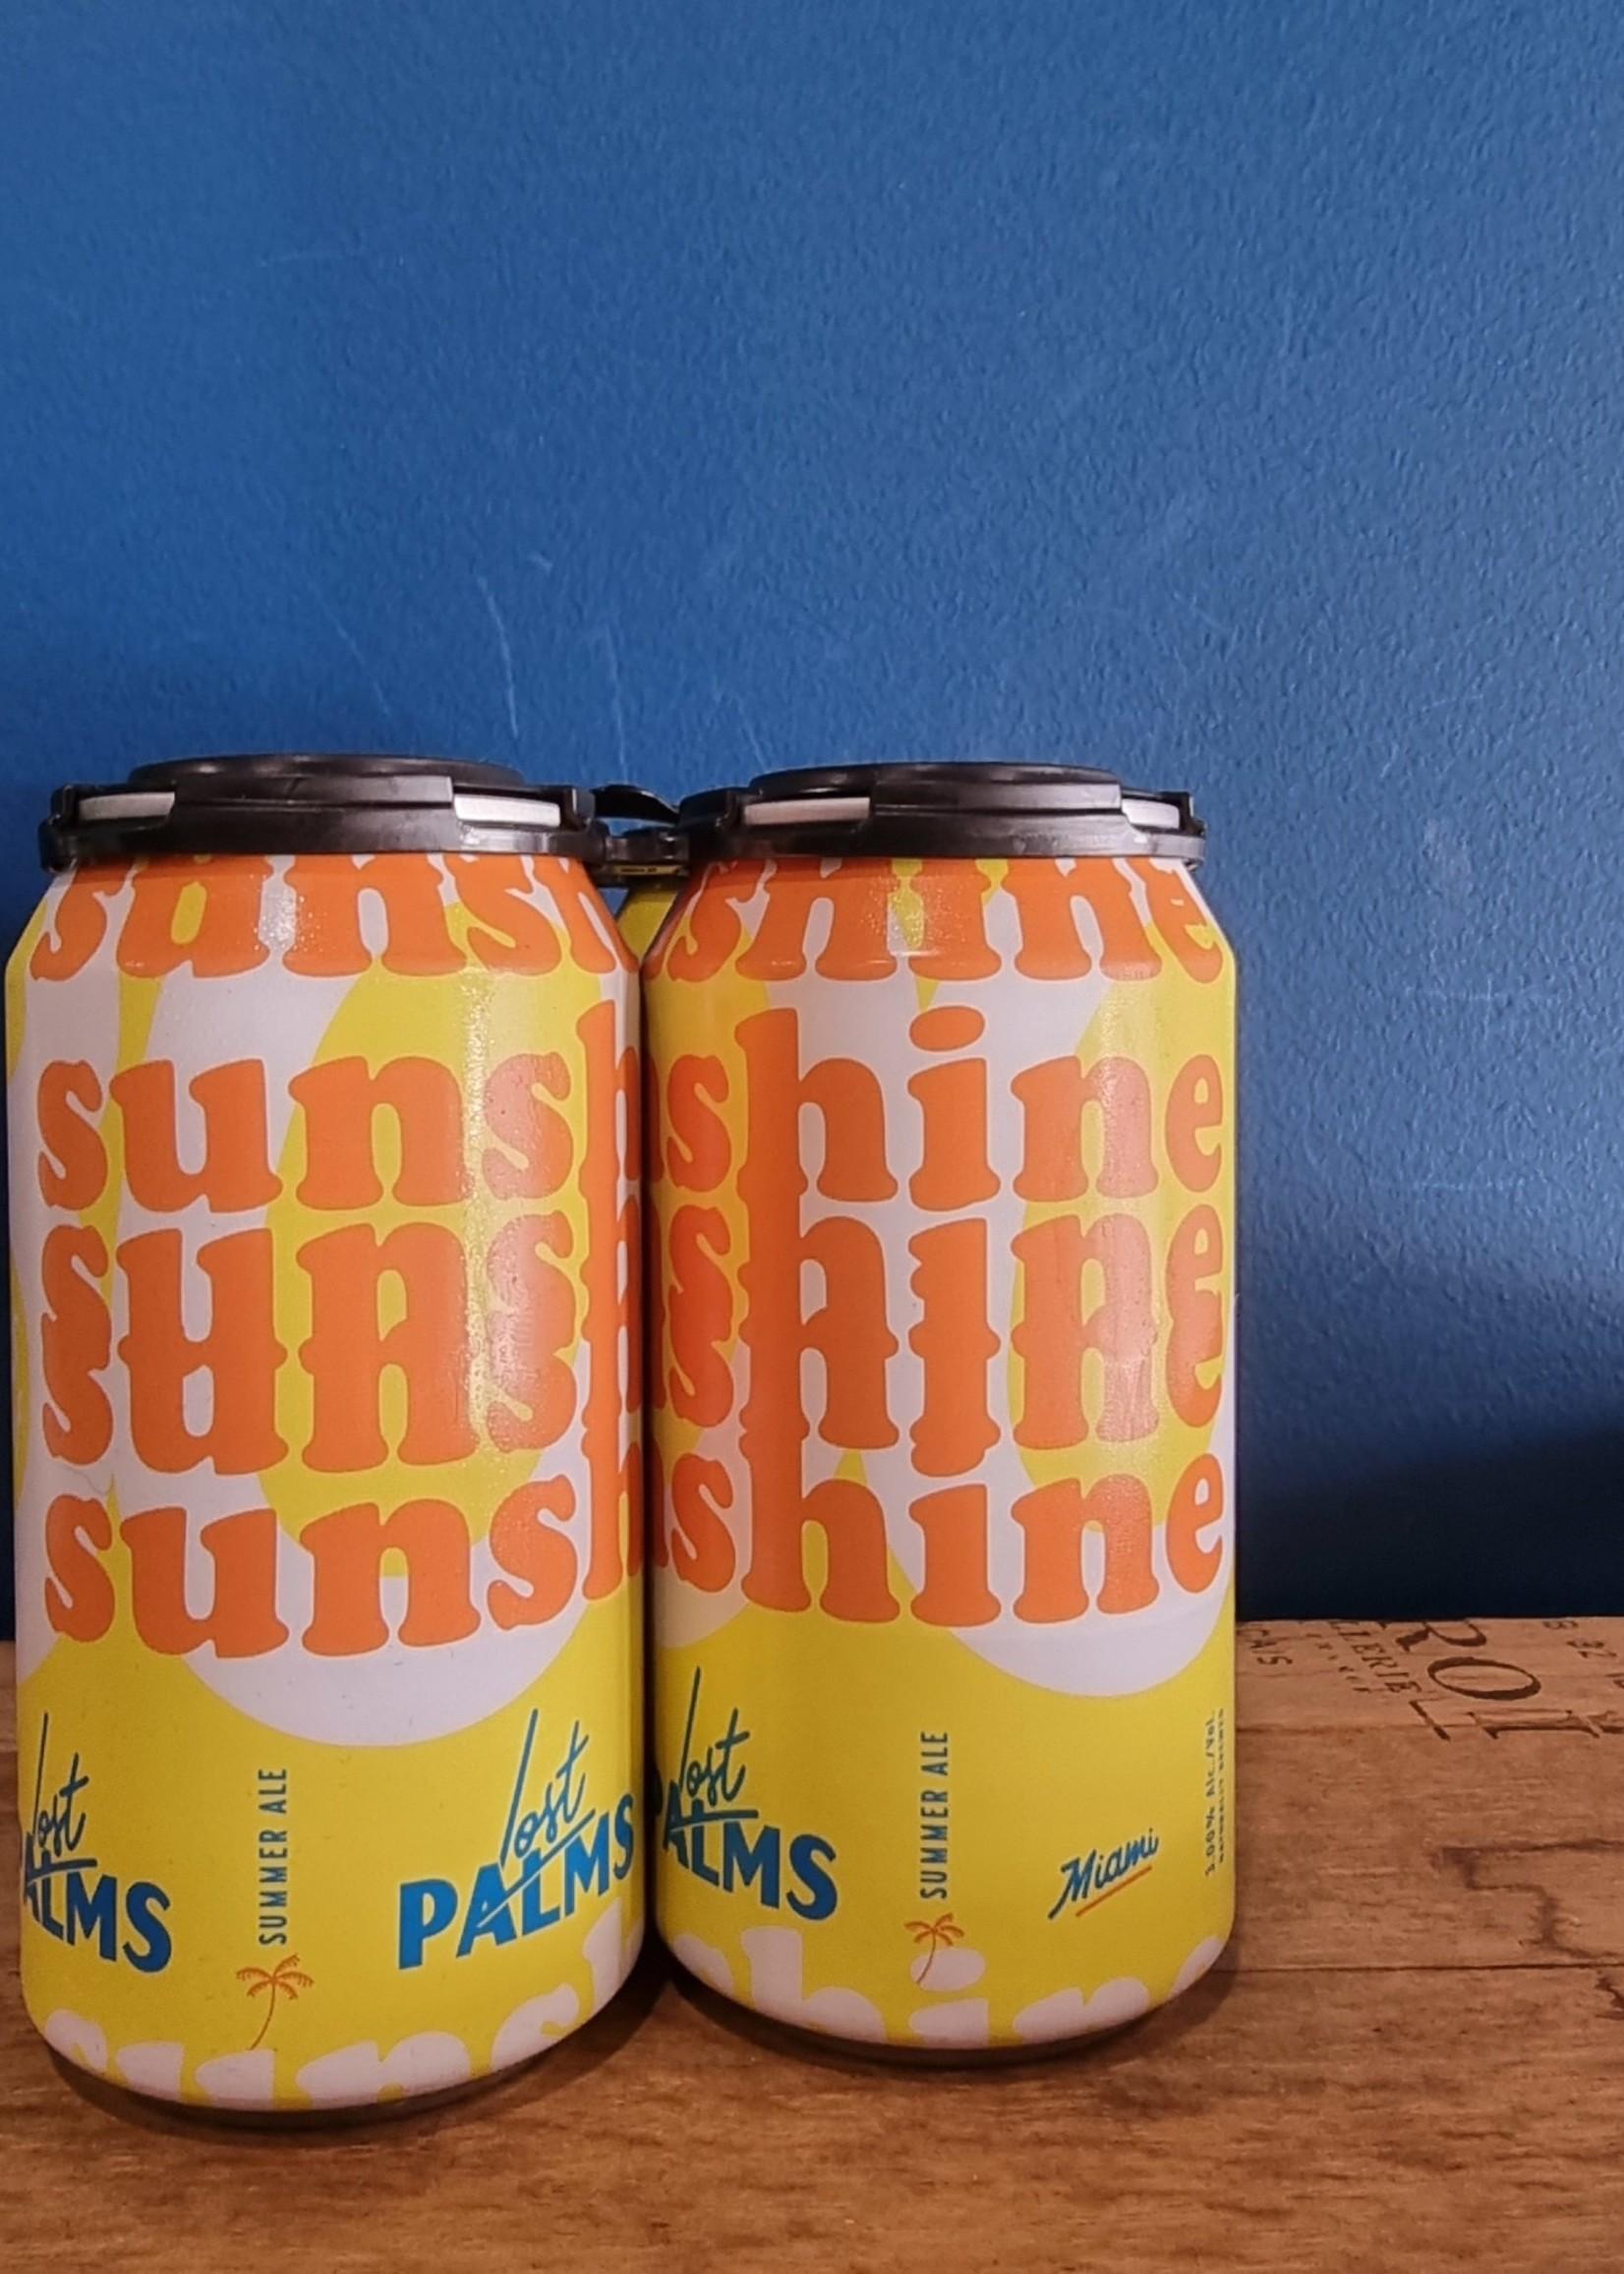 Lost Palms 300 Days of Sunshine